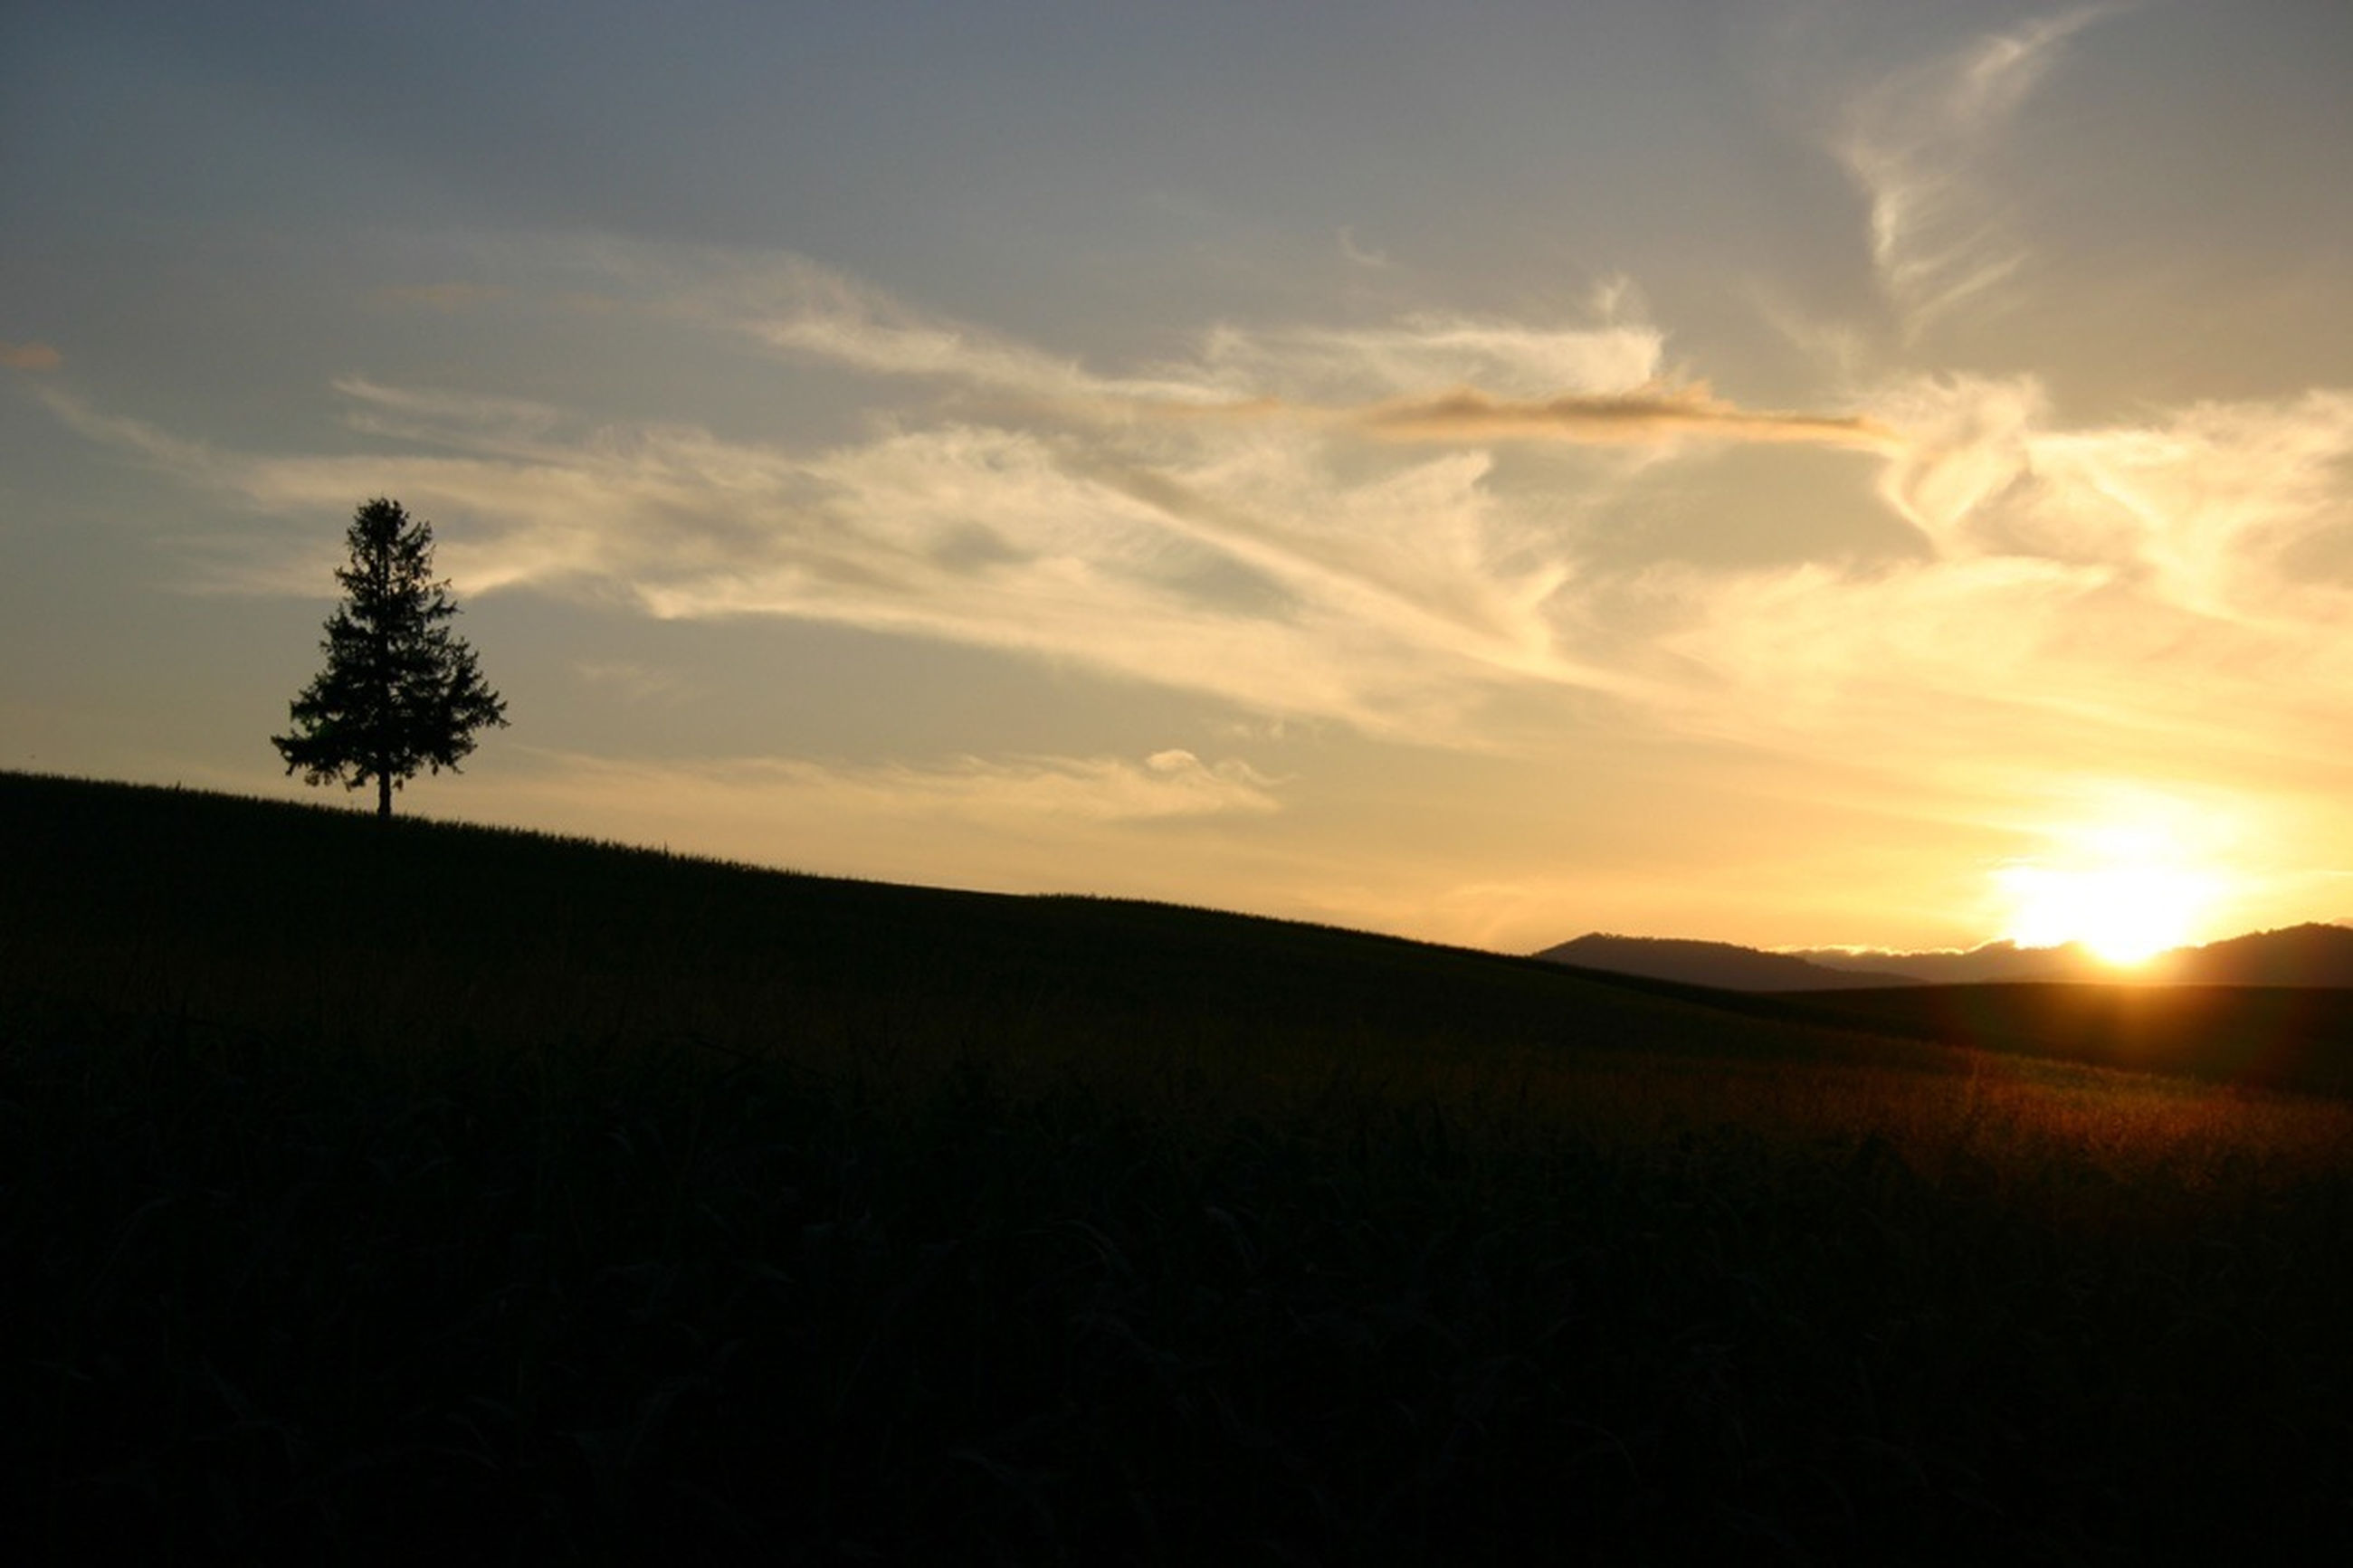 sunset, silhouette, tranquil scene, sun, tranquility, scenics, sky, landscape, beauty in nature, nature, sunlight, tree, sunbeam, idyllic, cloud - sky, mountain, field, cloud, non-urban scene, outdoors